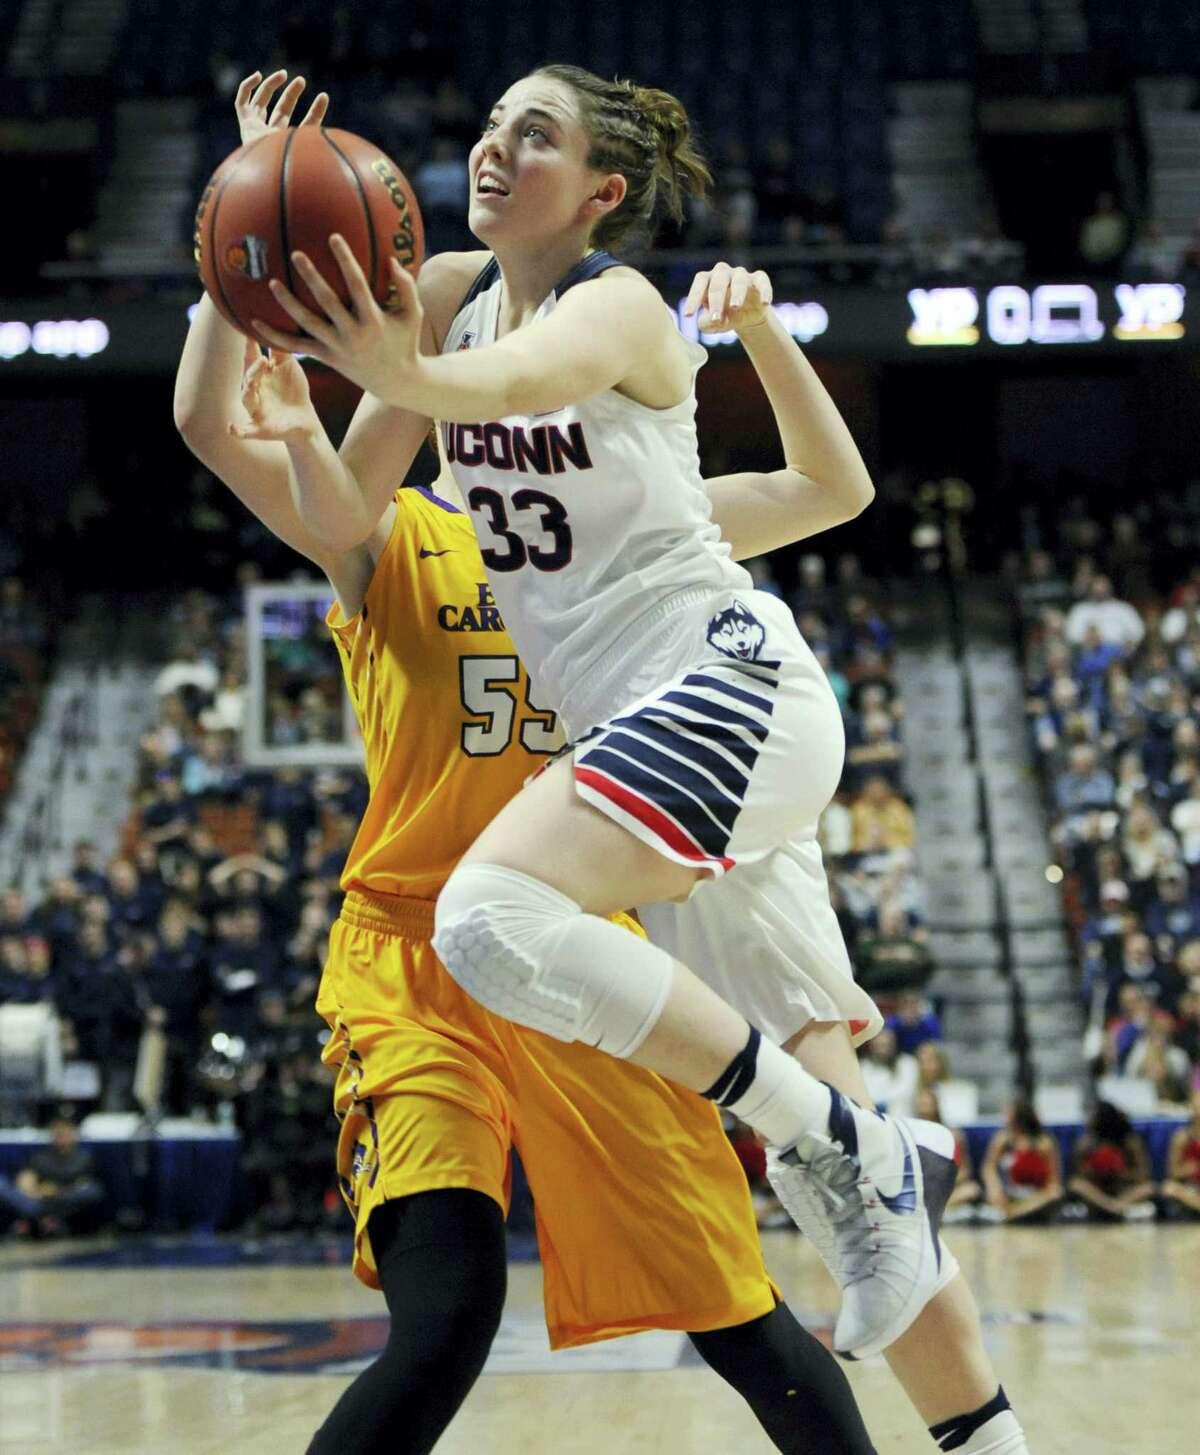 UConn's Katie Lou Samuelson drives to the basket around East Carolina's Marina Laramie during the first half Saturday.